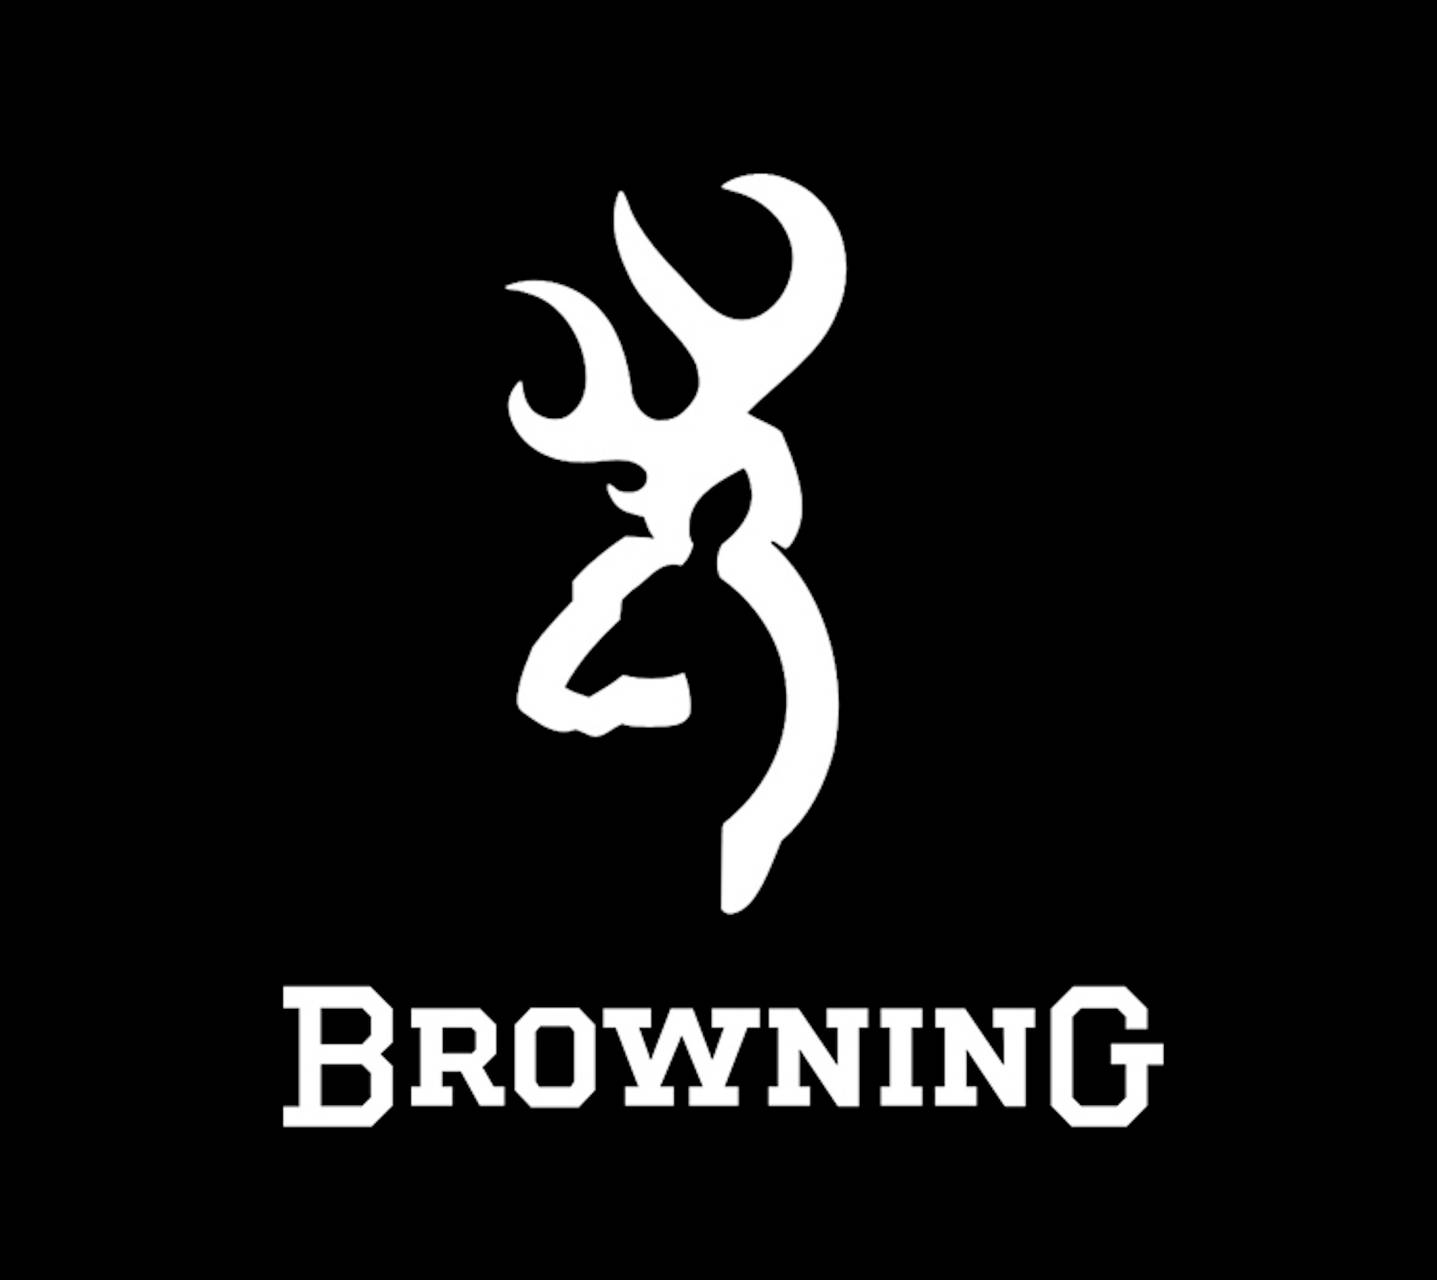 Browning Logo Wallpapers - Top Free